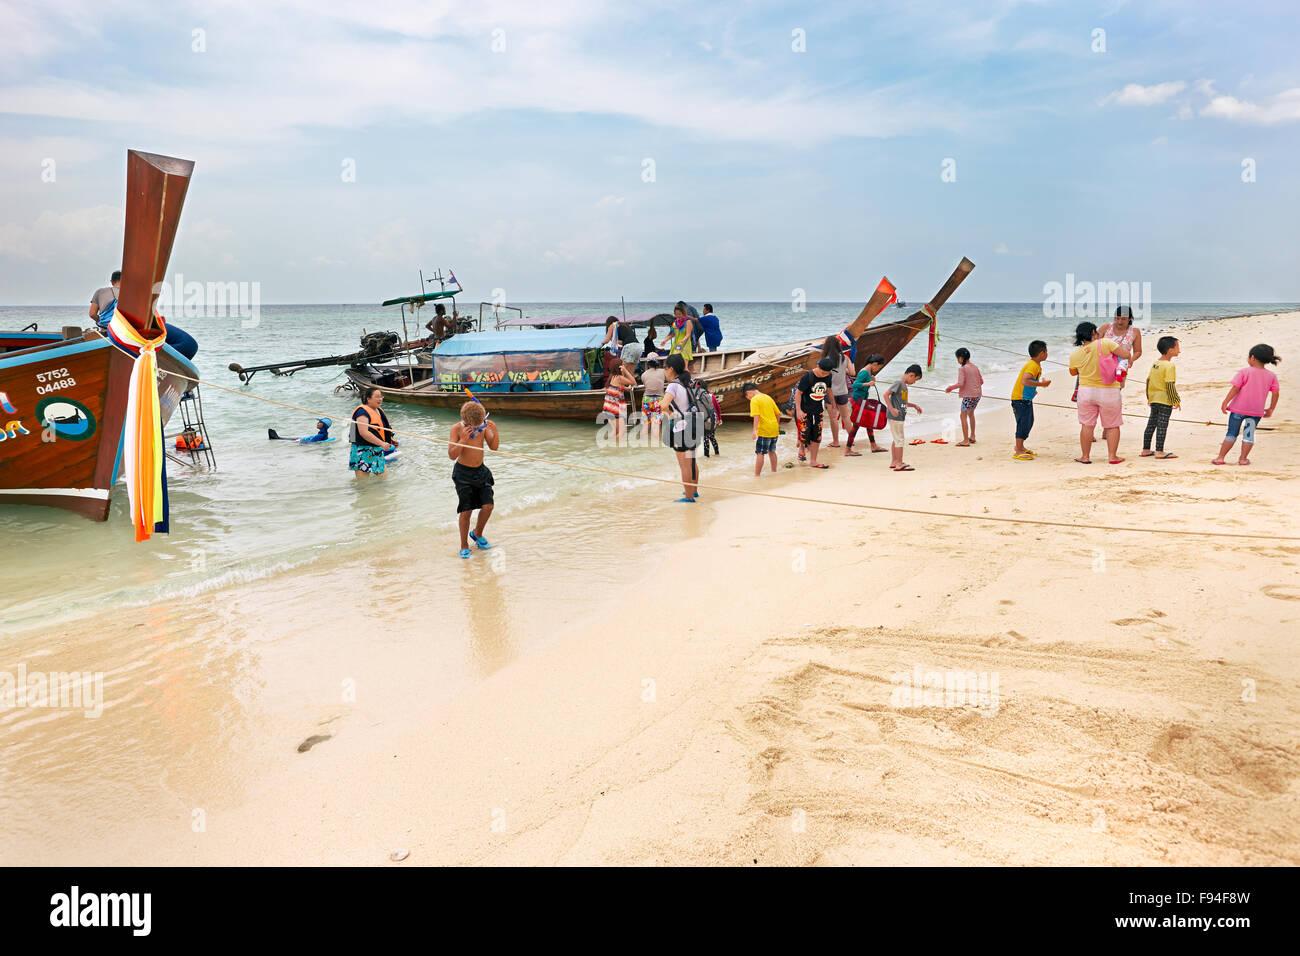 Tourists disembark from longtail boat. Poda Island (Koh Poda), Krabi Province, Thailand. - Stock Image